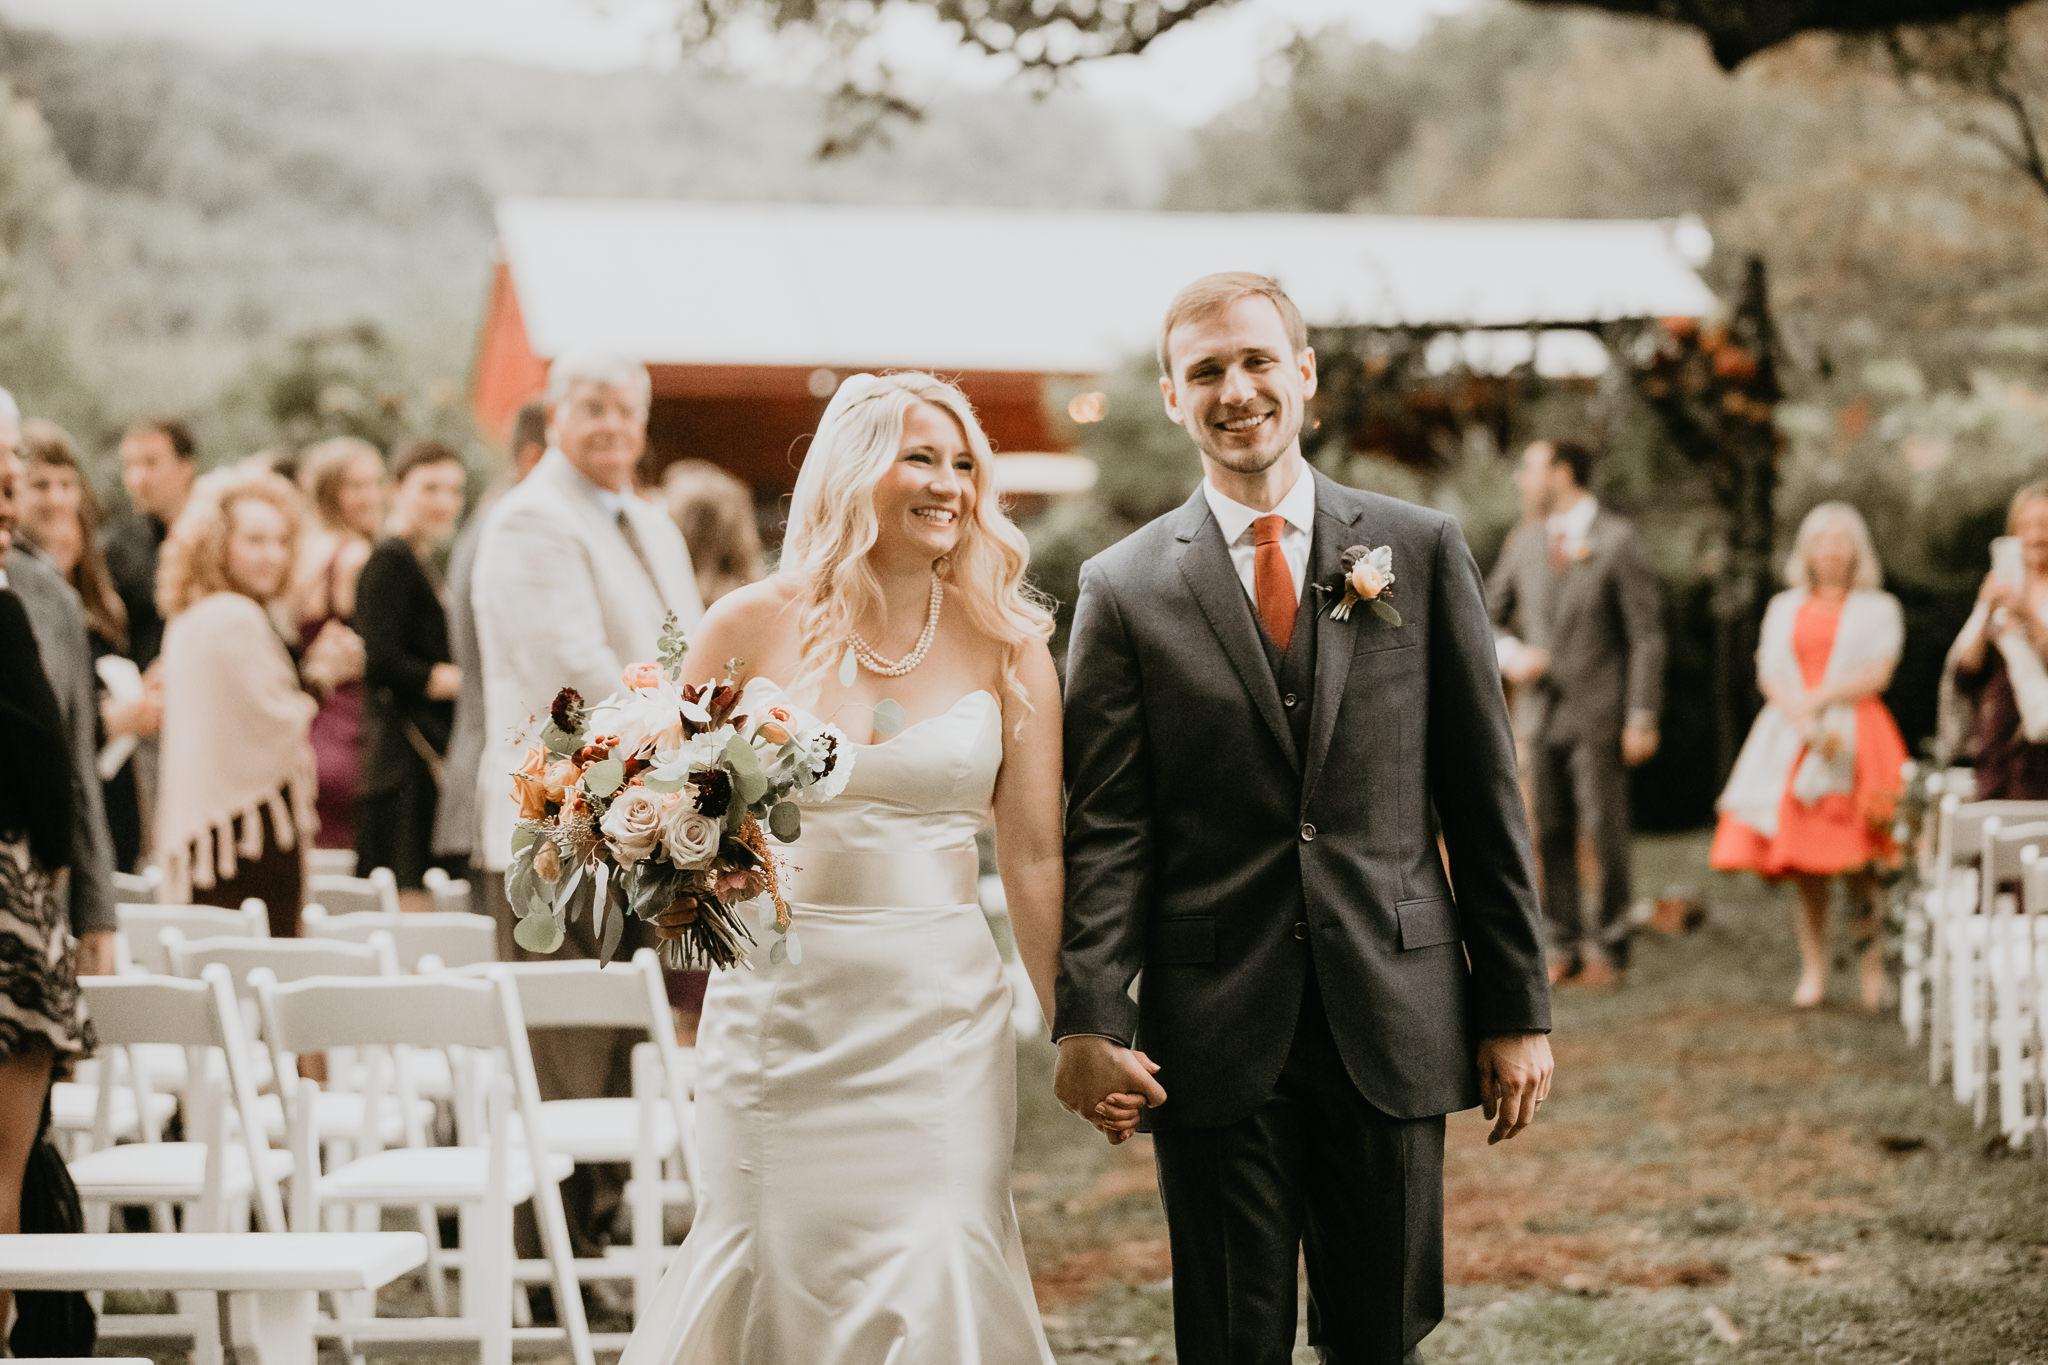 Sundara - Weddings - Virginia - Best Wedding Photographer - Pat Cori Photography-52.jpg